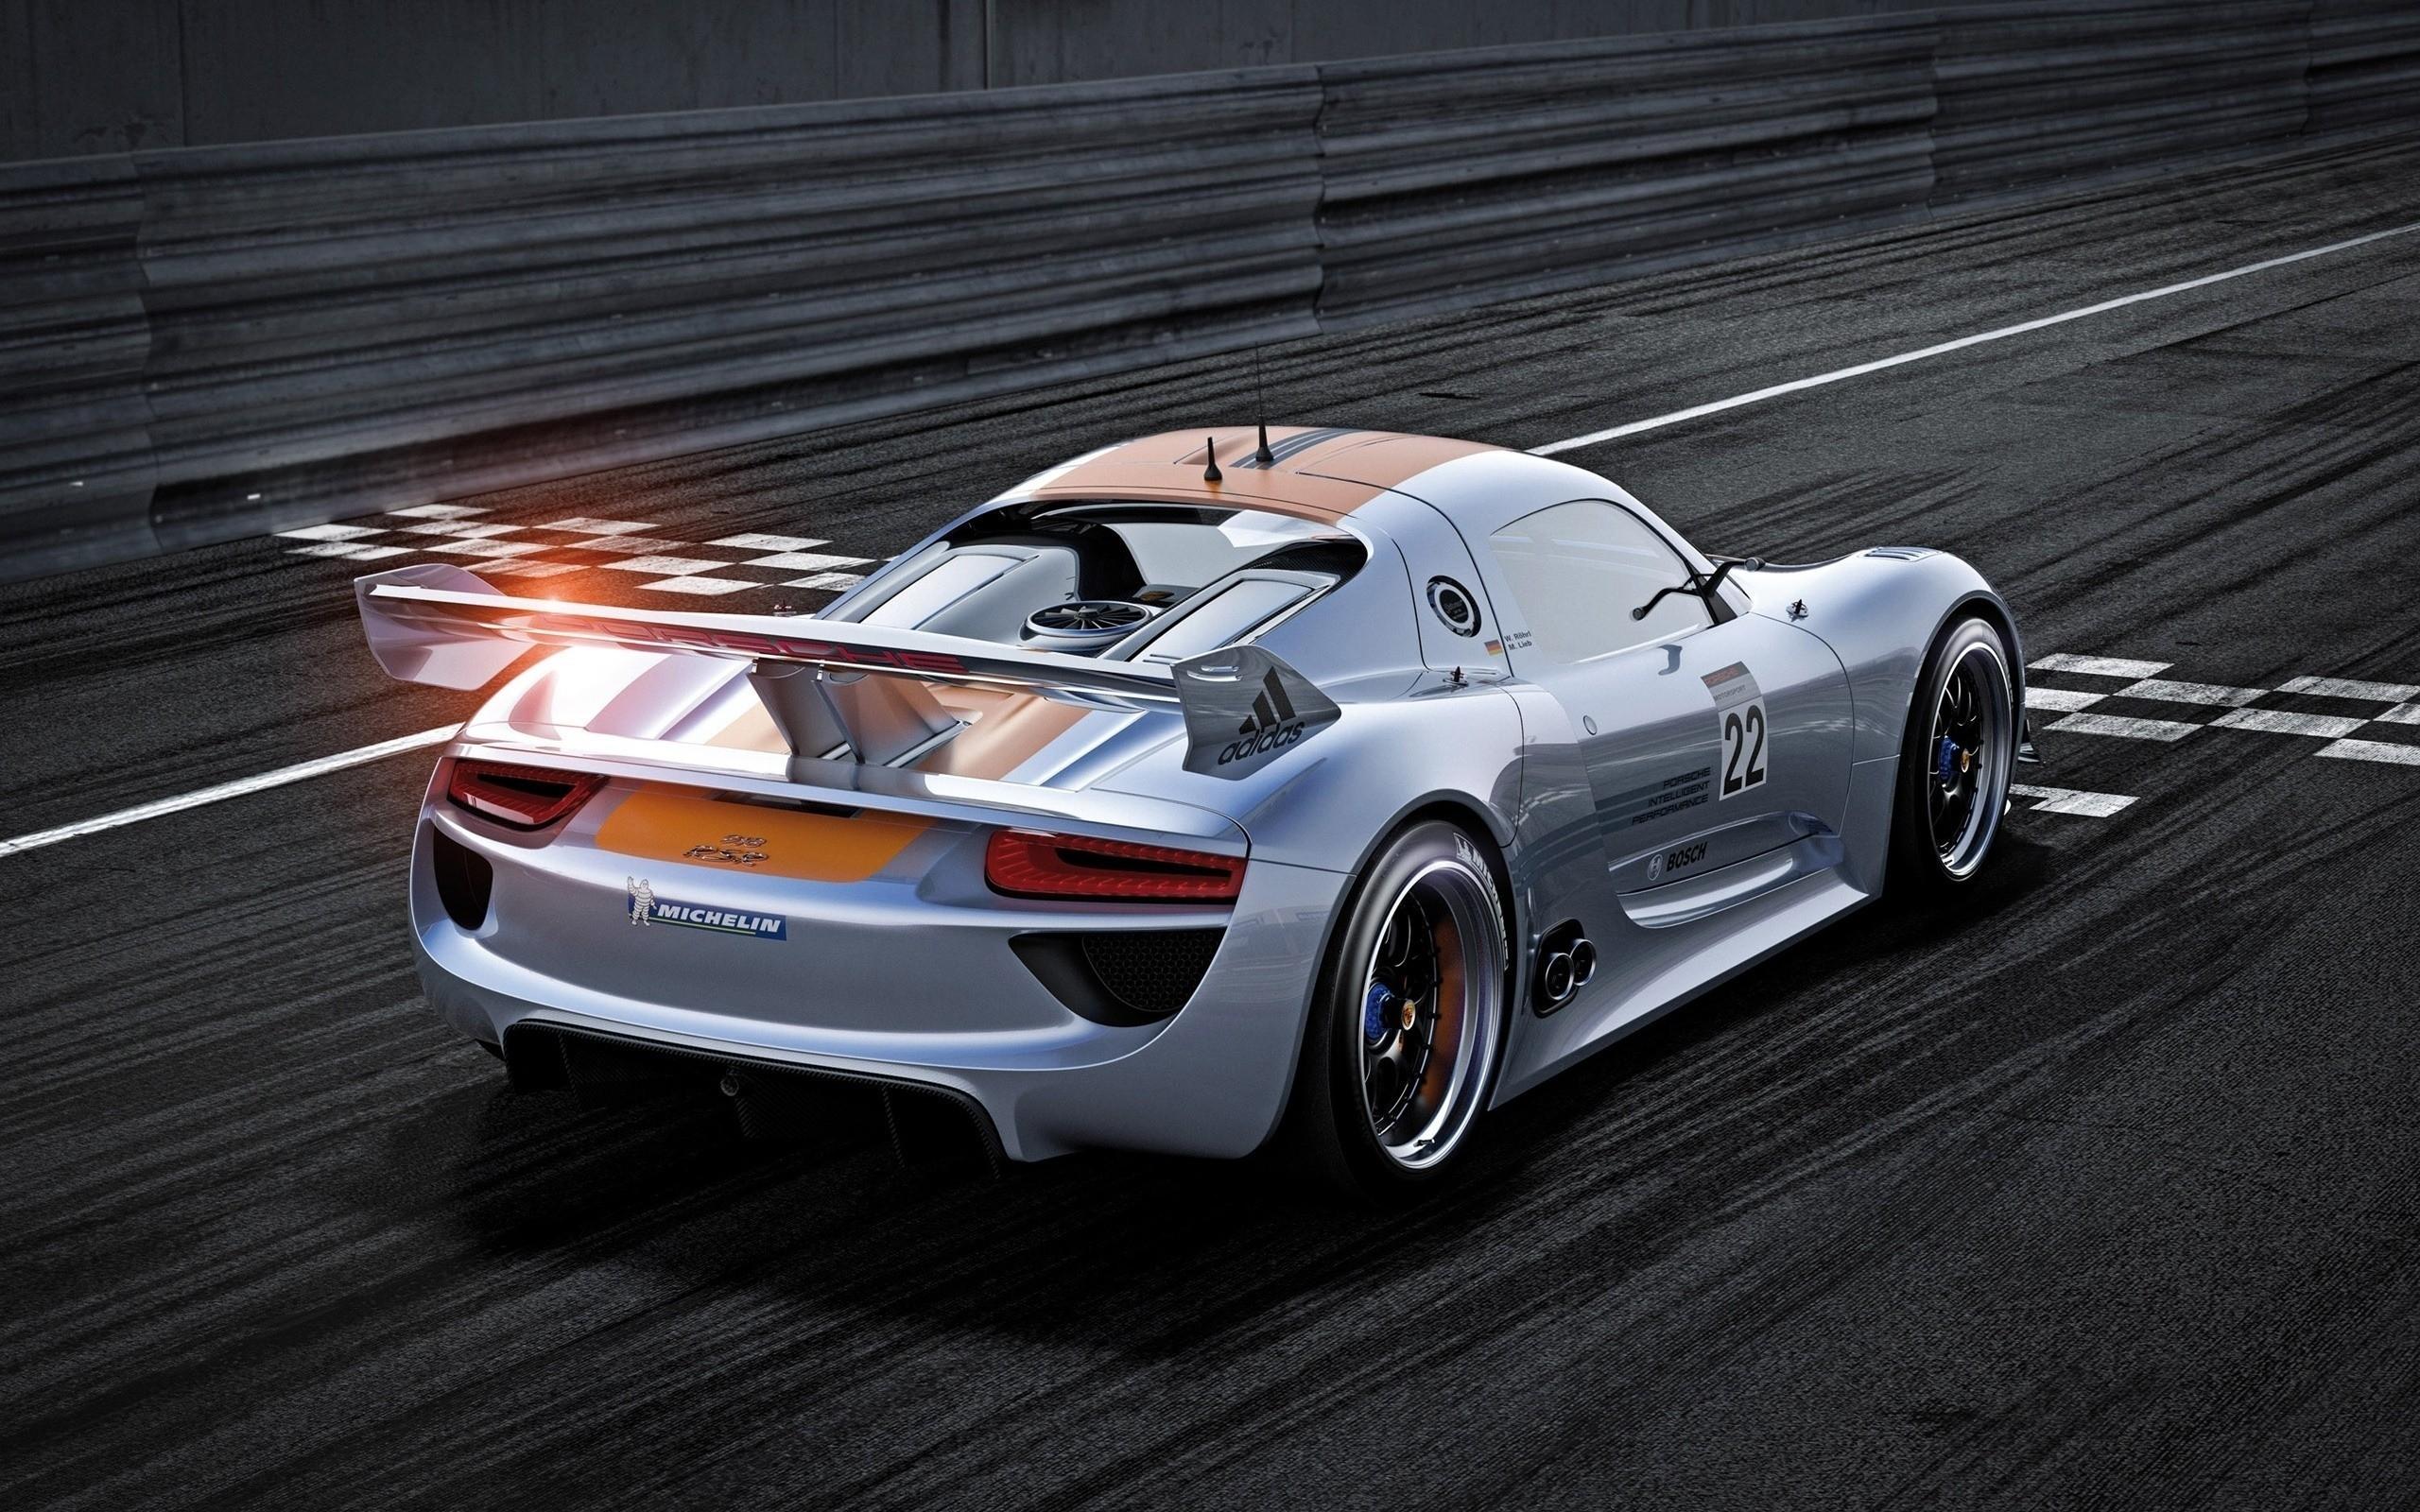 race-cars-car-vehicle-Porsche-sports-car-race-tracks-performance-car-Porsche-918-Spyder-prototypes-wheel-supercar-land-vehicle-automotive-design-automobile-make-concept-car-203246 Interesting Hinh Anh Xe Porsche 918 Spyder Cars Trend